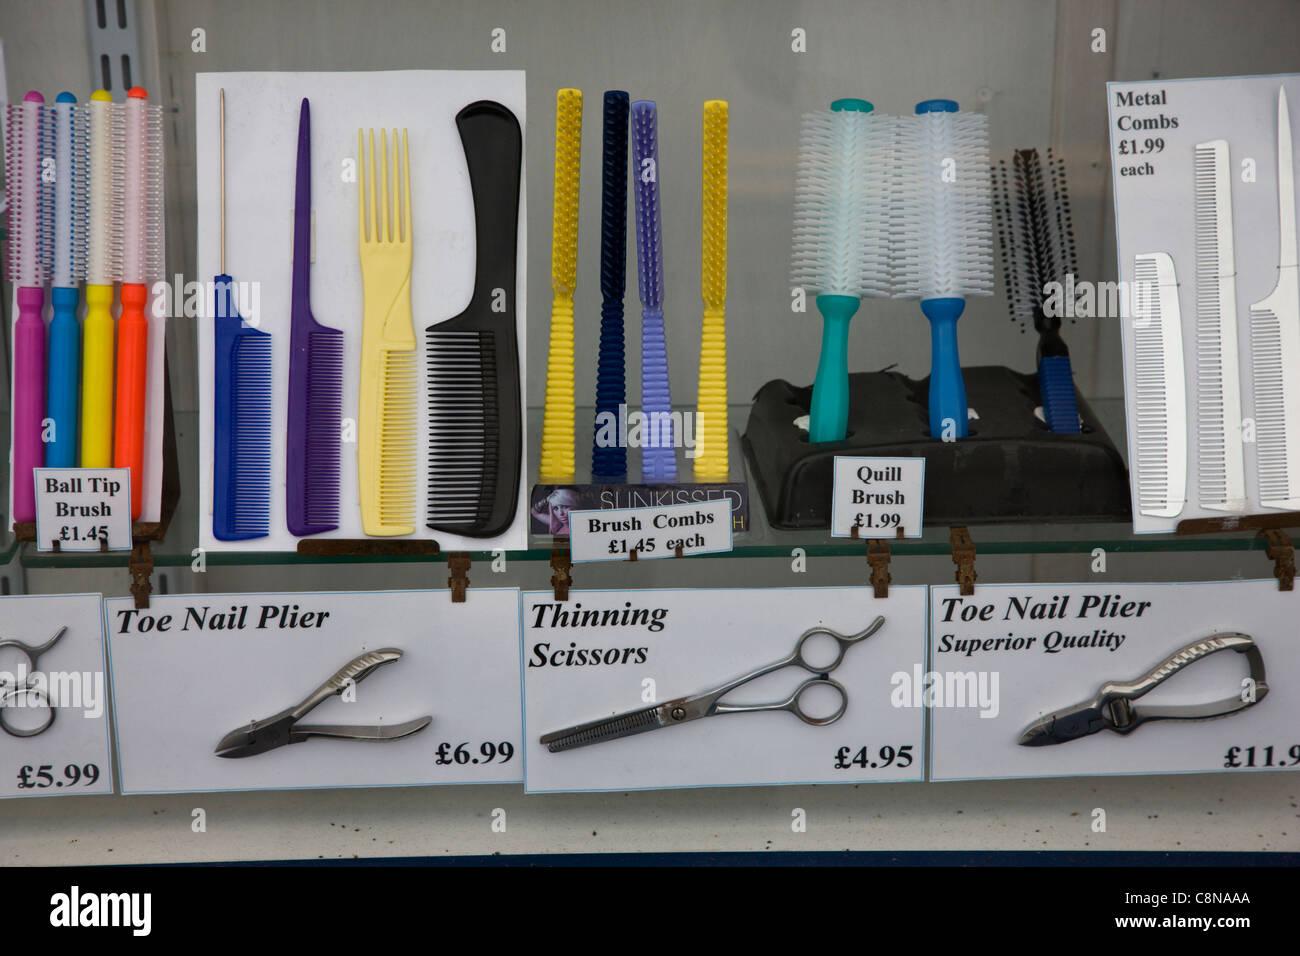 Hairdressing Equipment Stock Photos & Hairdressing Equipment Stock ...